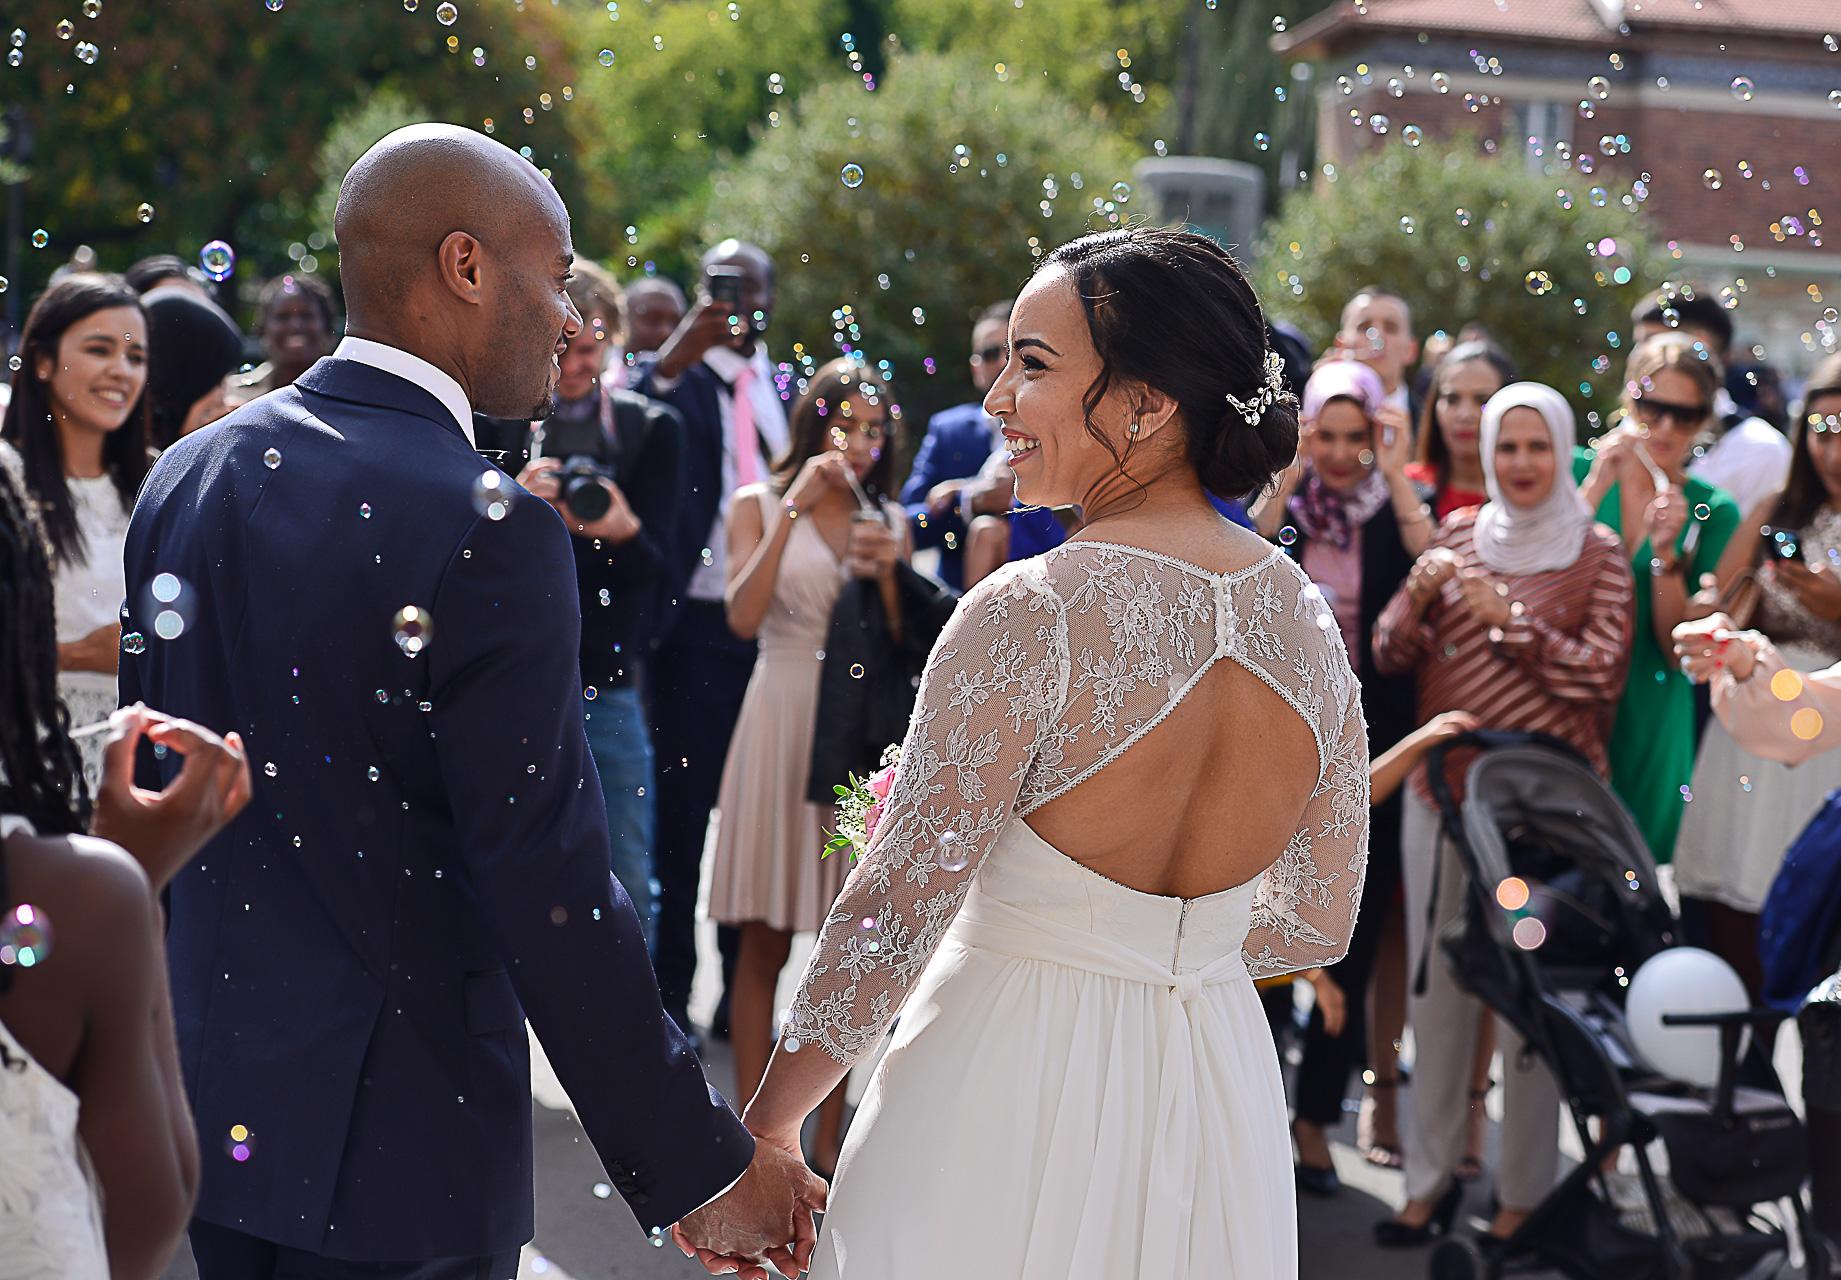 photographe-mariage-mariees-mairie-paris-asma-yannick